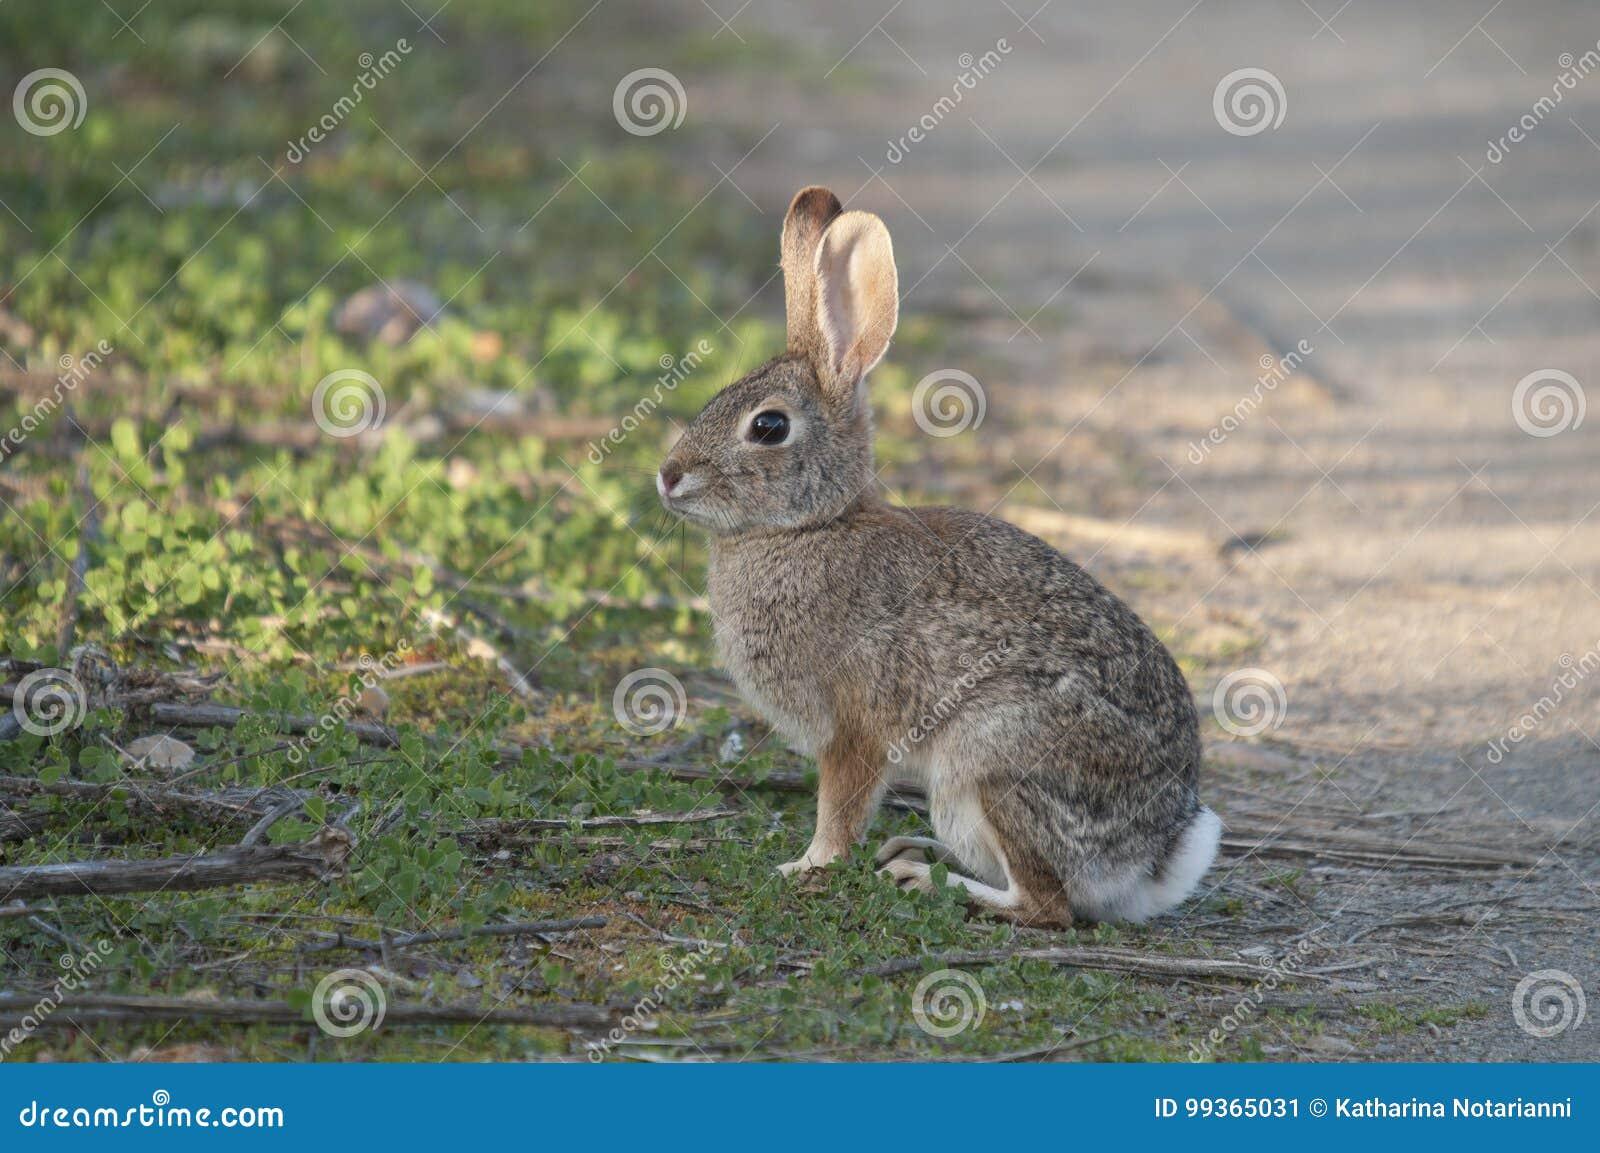 Desert Cottontail Rabbit Sylvilagus audubonii in the Meadow